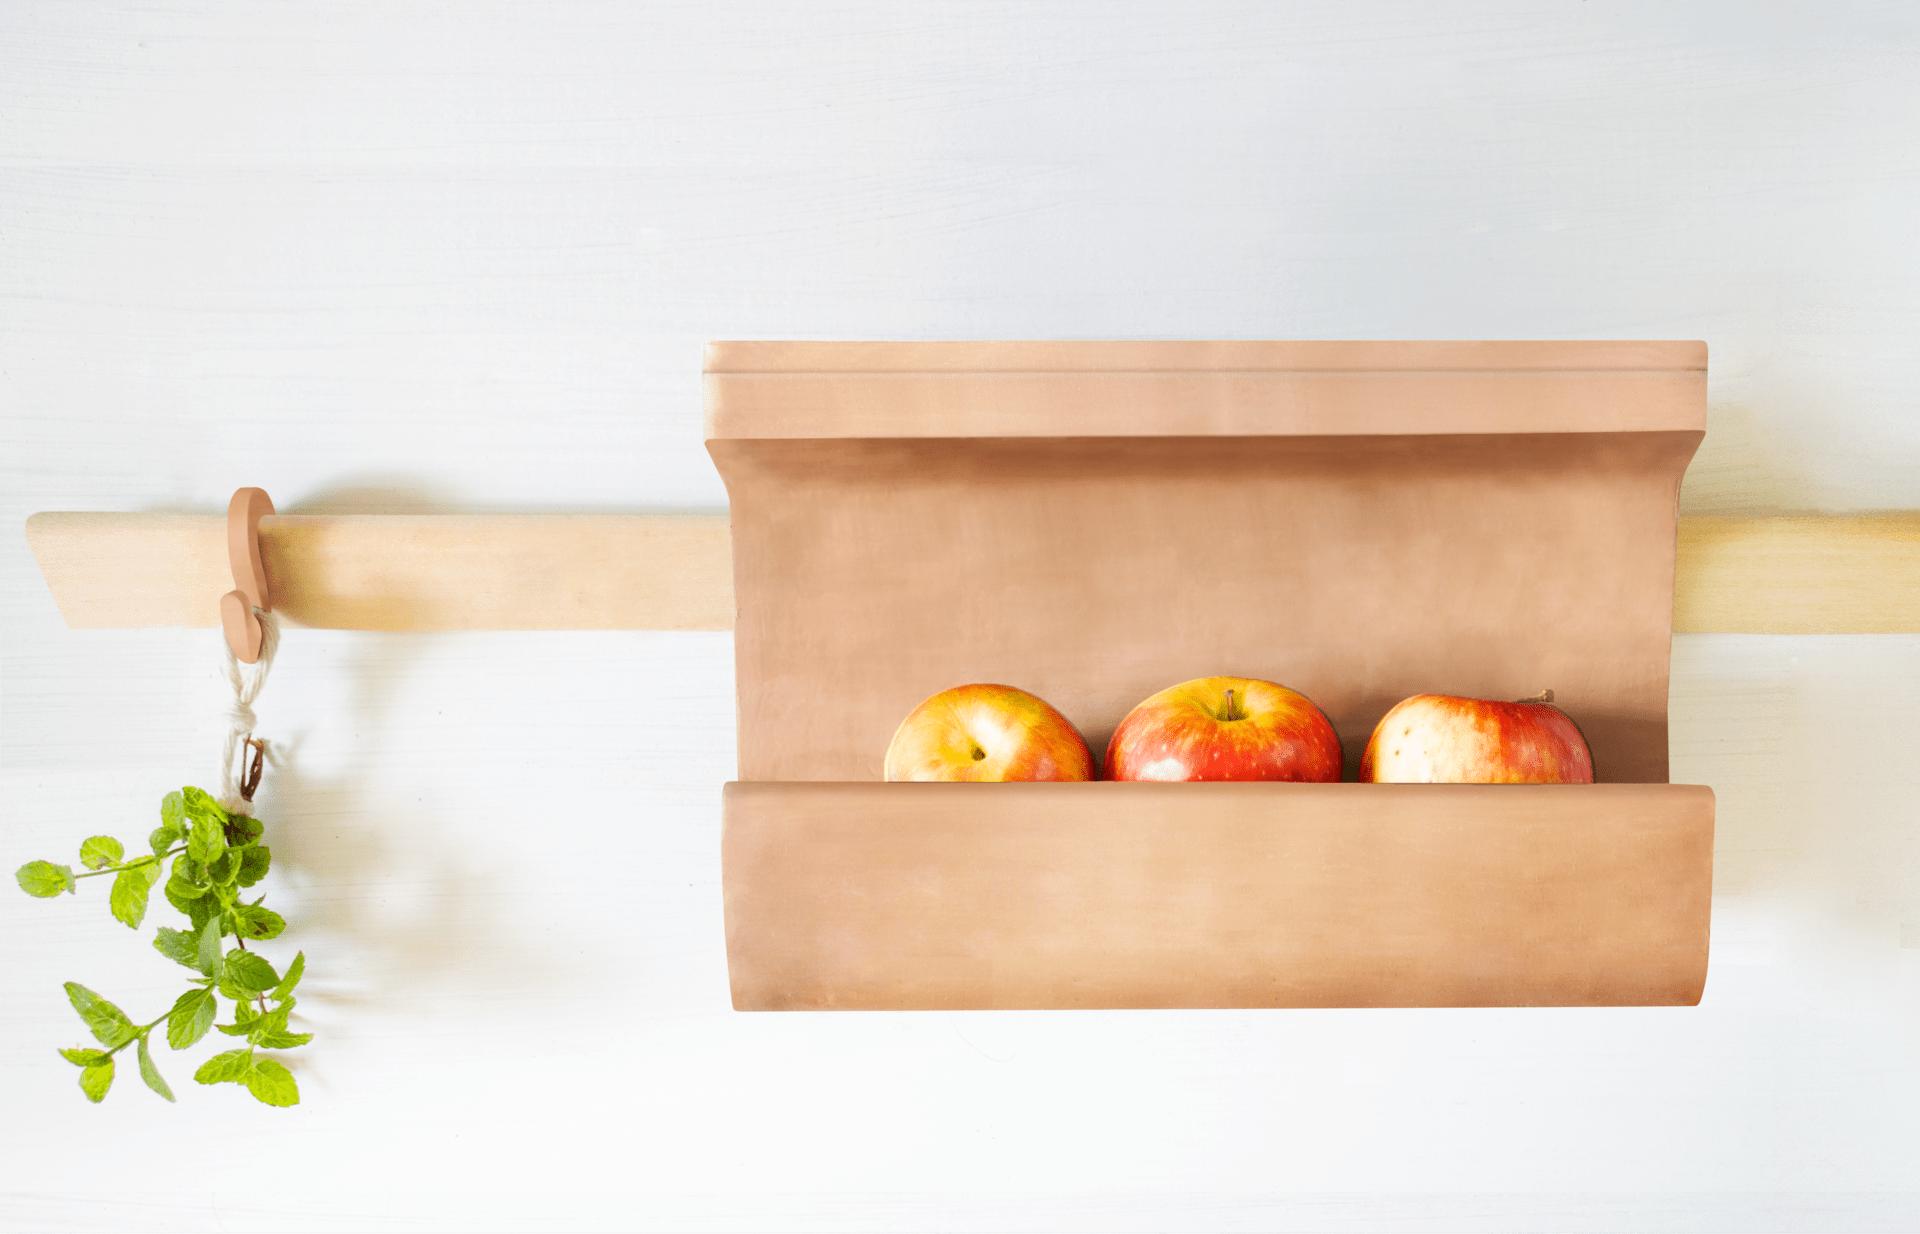 The Fruit Shelf